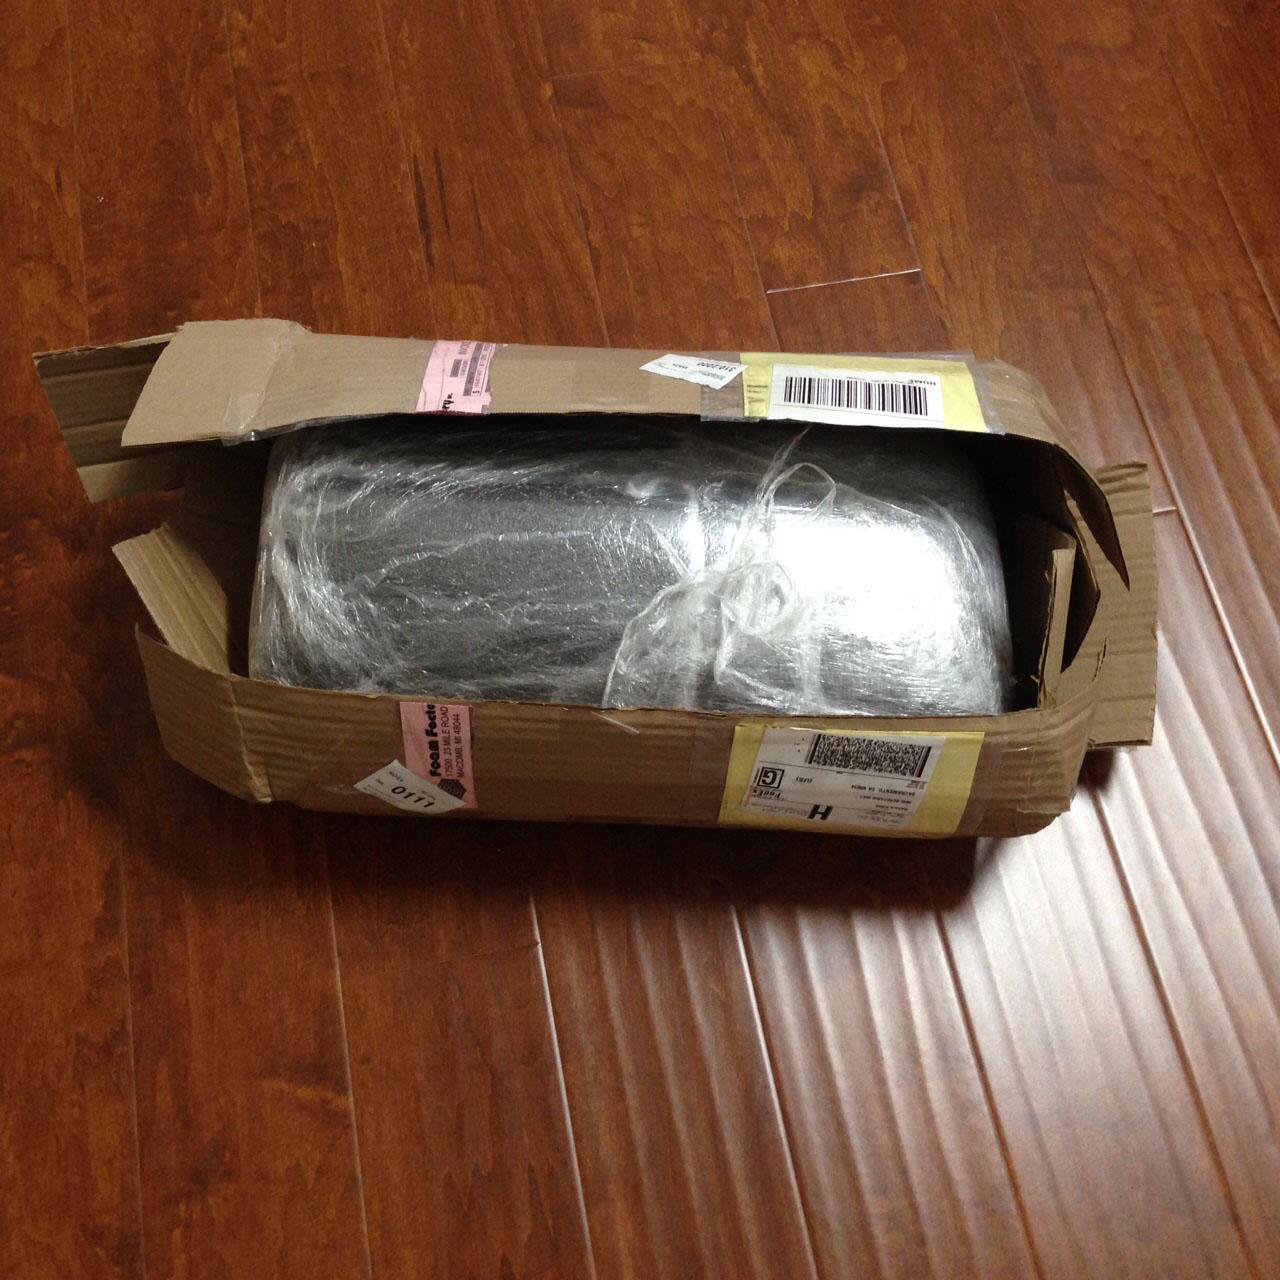 foam in box